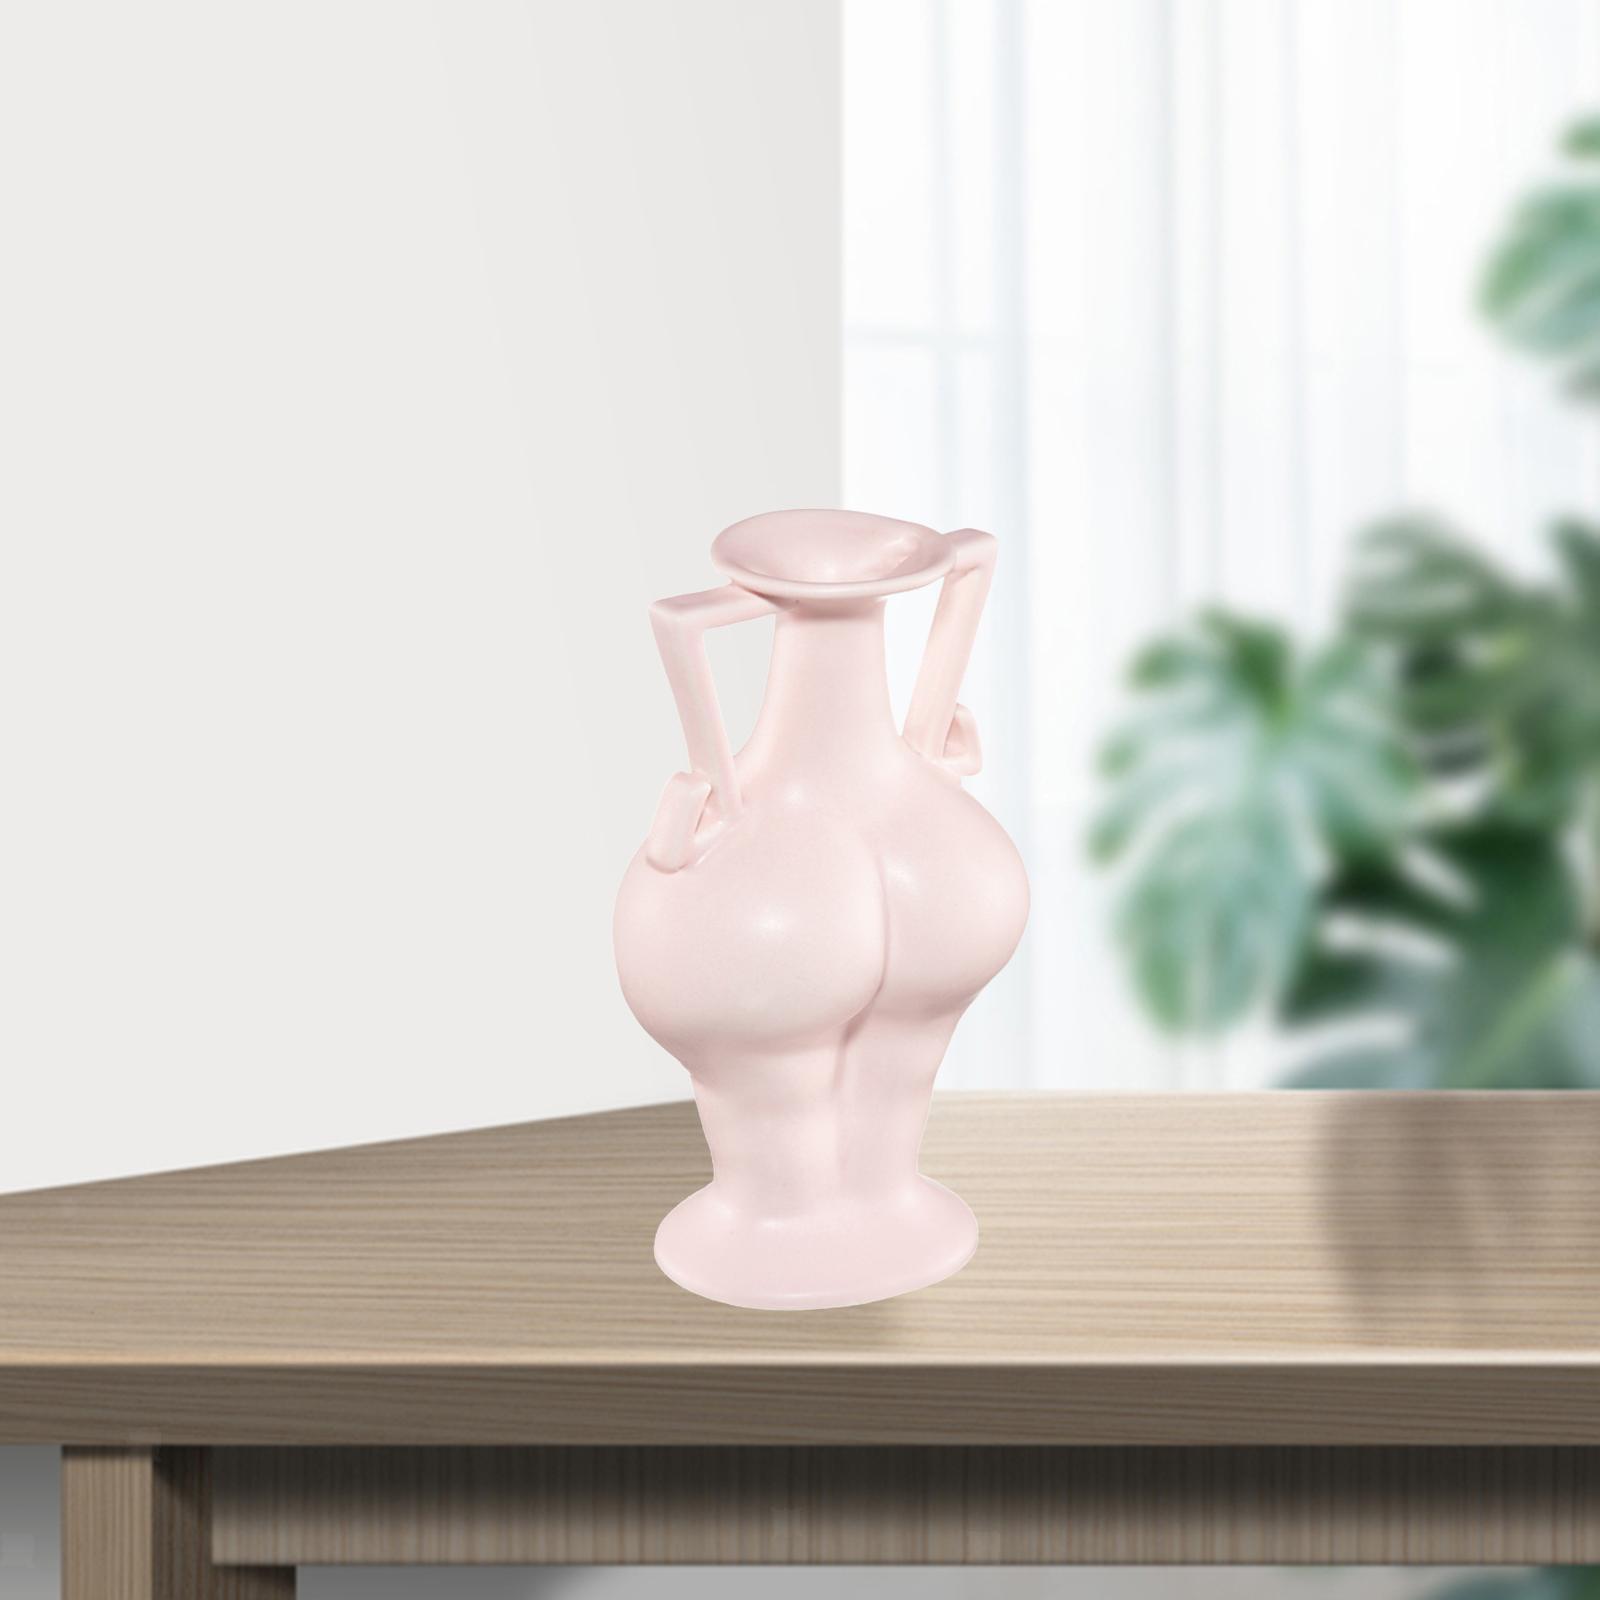 Indexbild 48 - Blumenvase Keramik Blumentöpfe Trockenblumenhalter Pflanzenvasen Wohnkultur